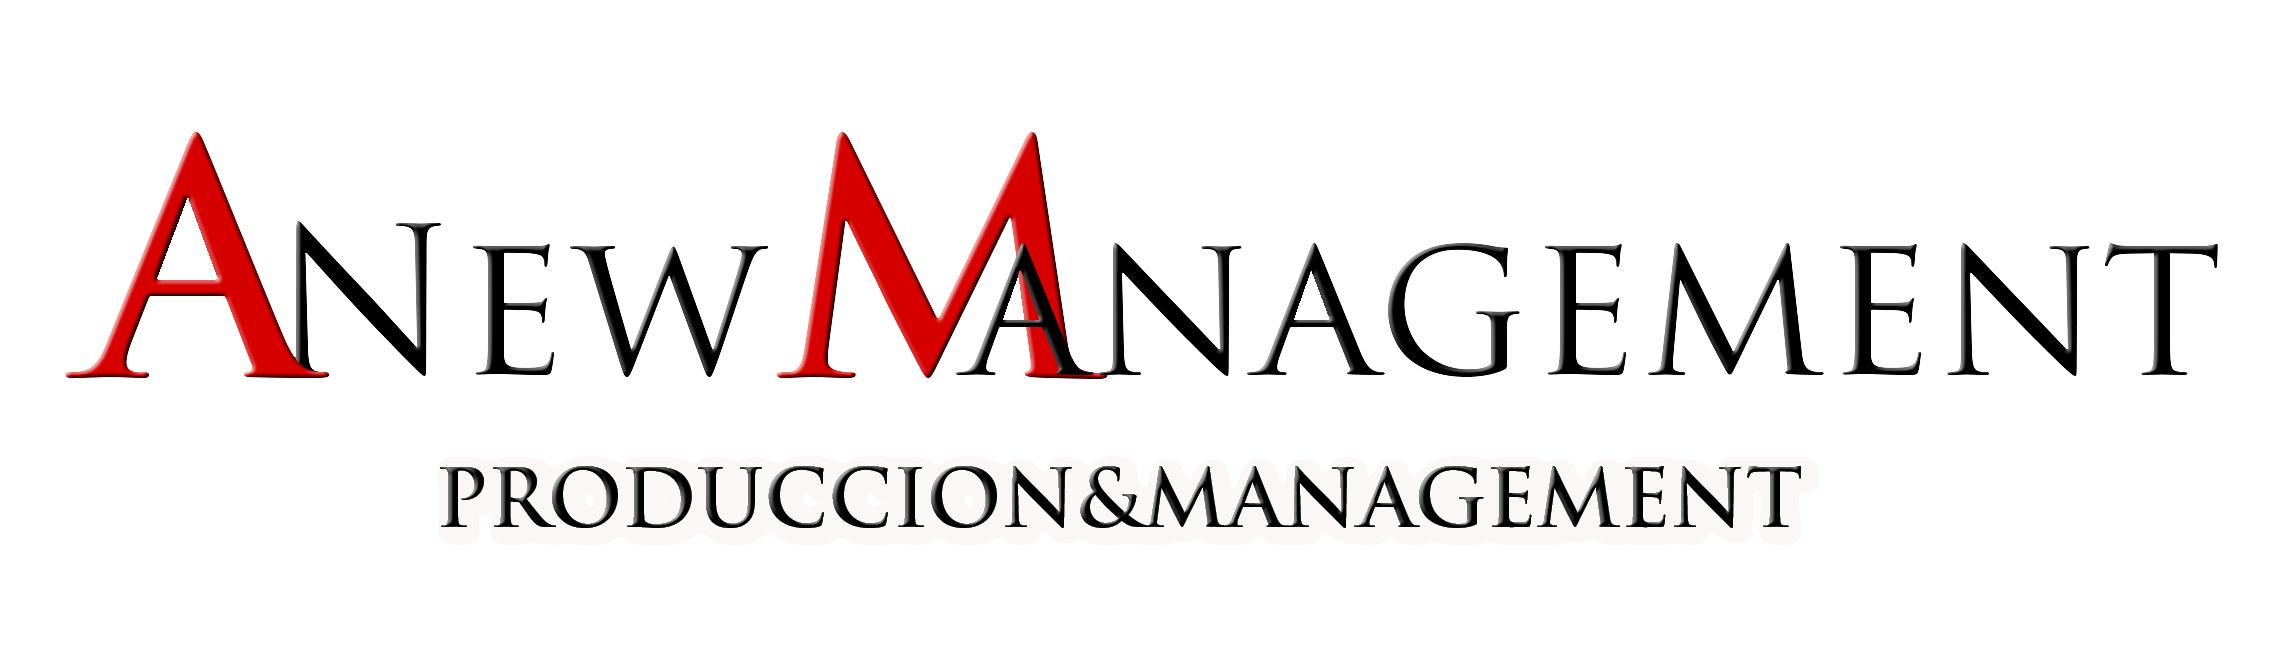 LogoManagementletrasnegras fondo blanco